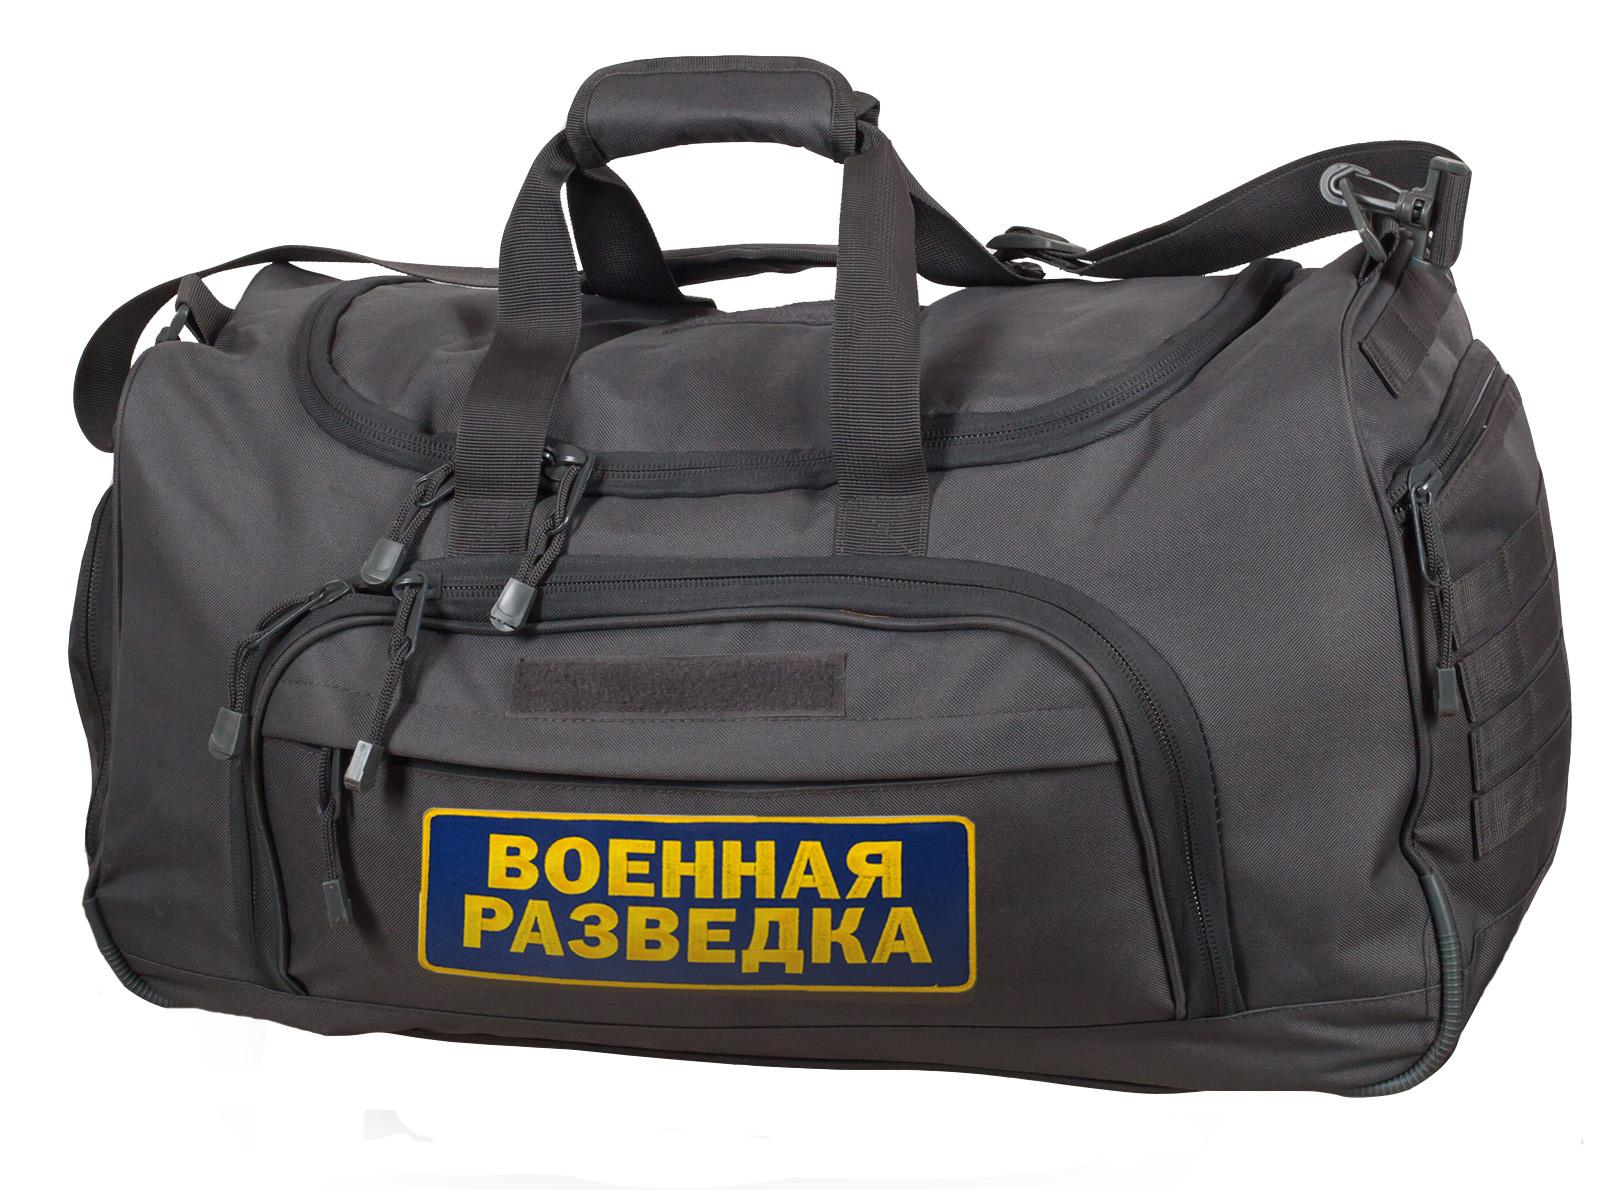 Легкая тканевая сумка Военная разведка